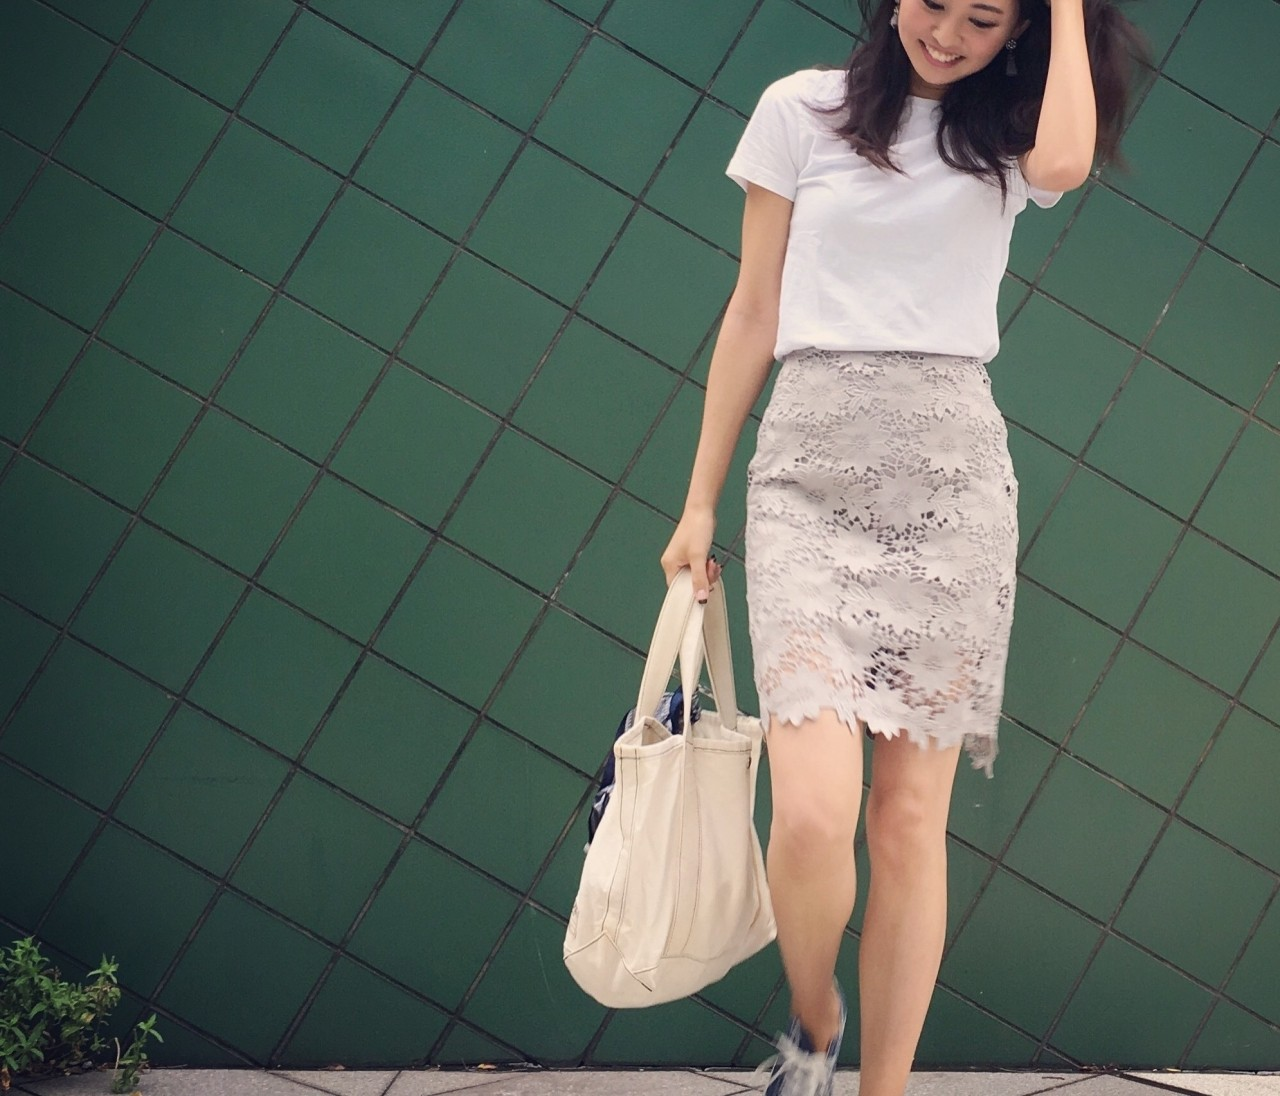 GUのメンズTシャツ×タイトスカートでお仕事コーデ。